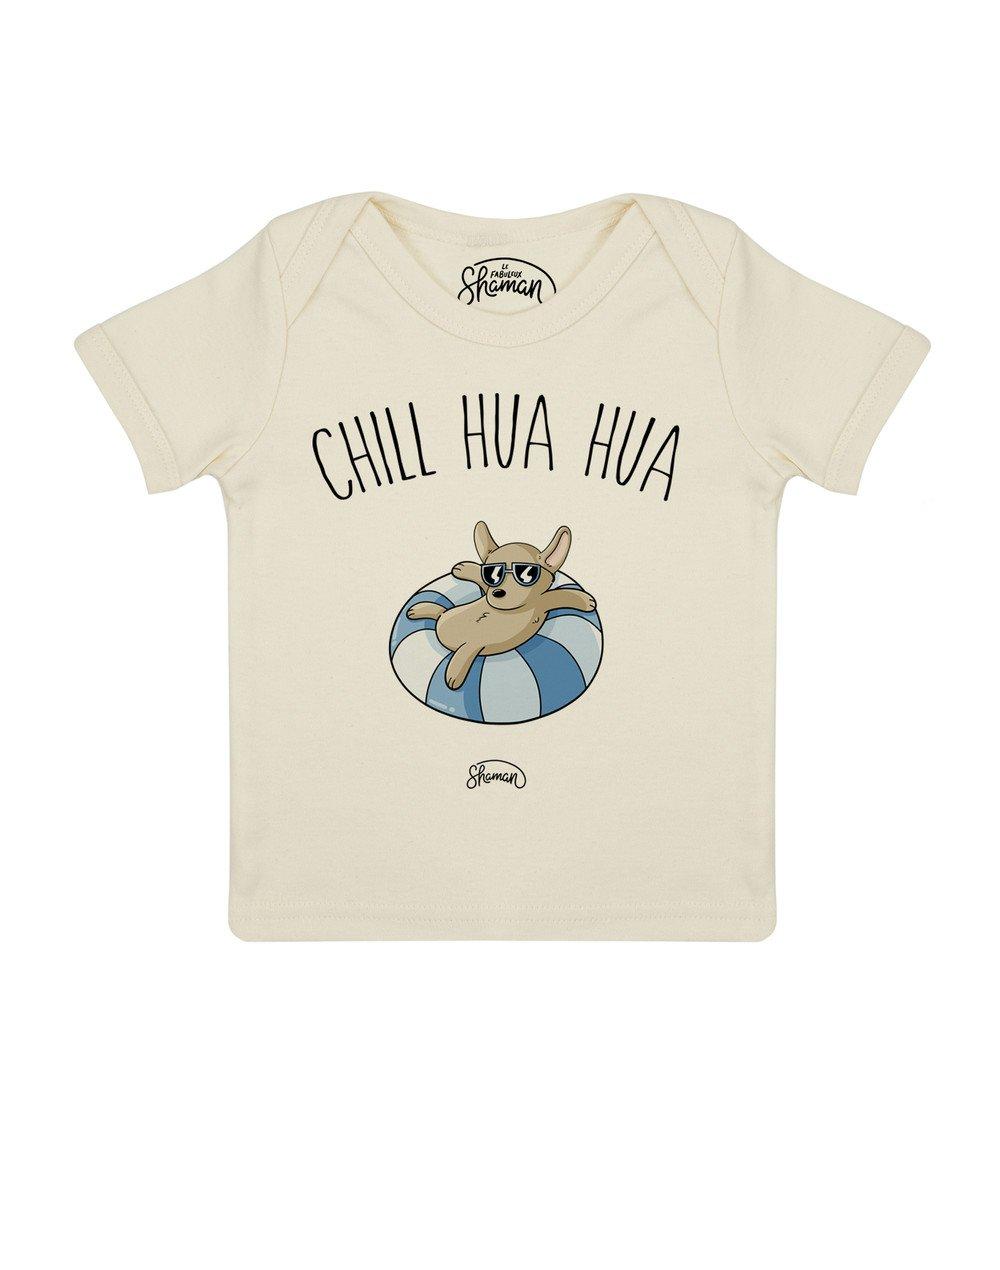 Tee shirt Chill hua hua